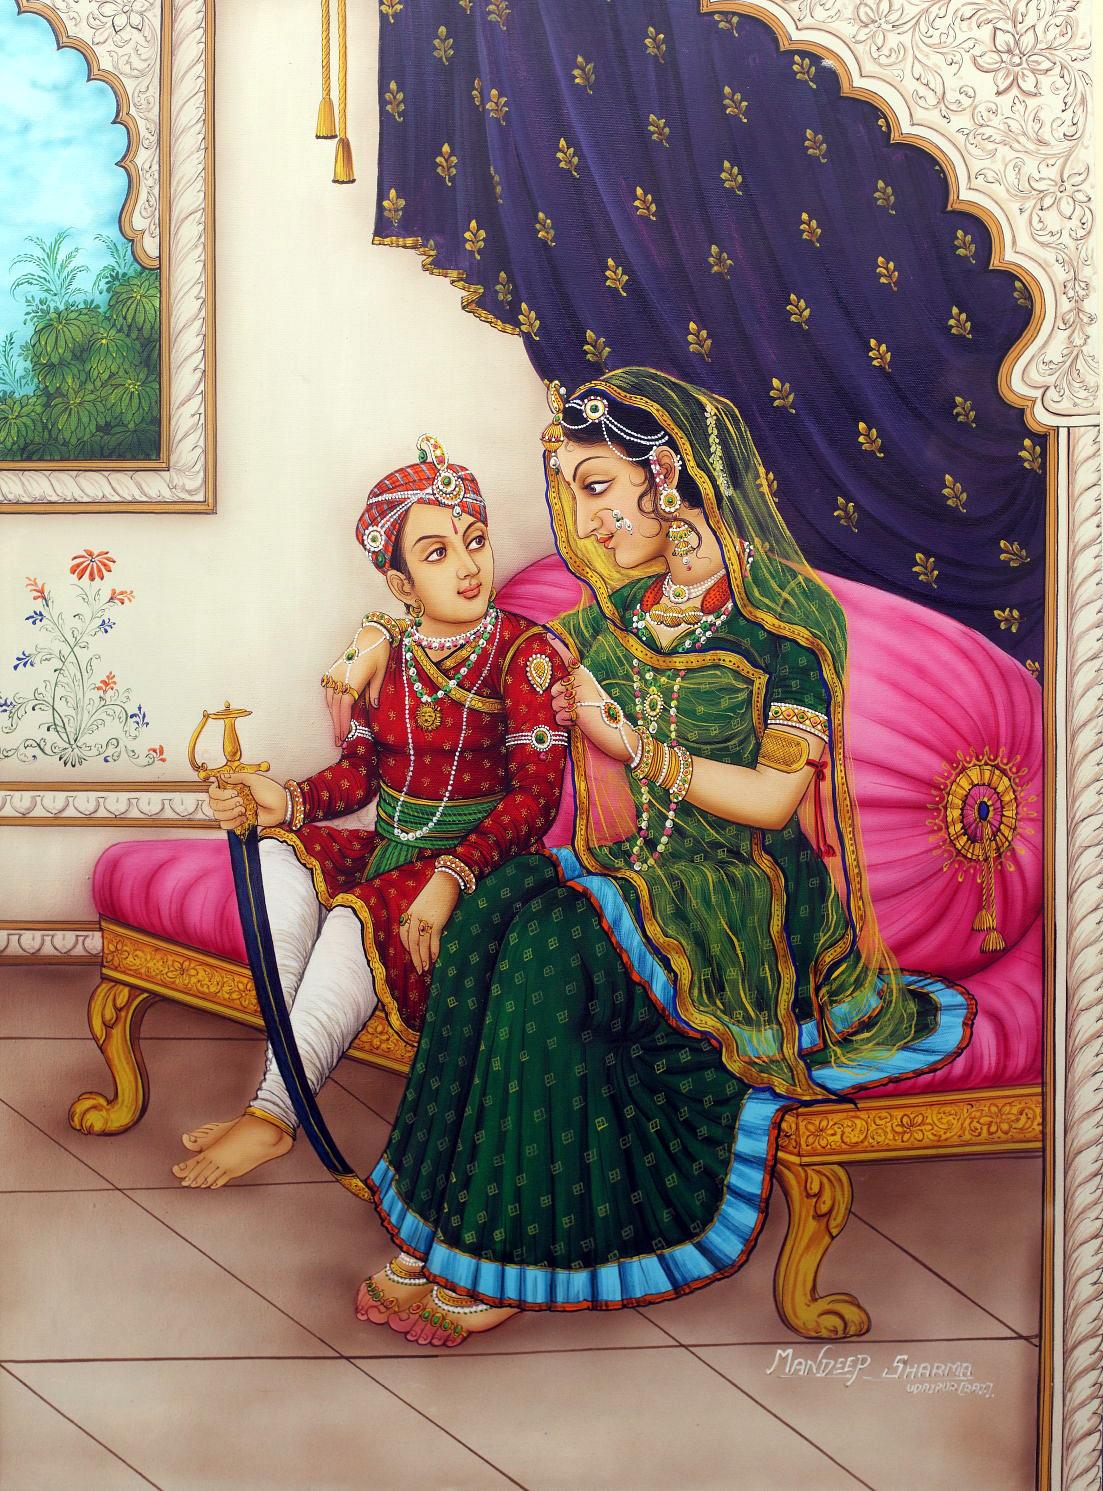 maharana pratap sword